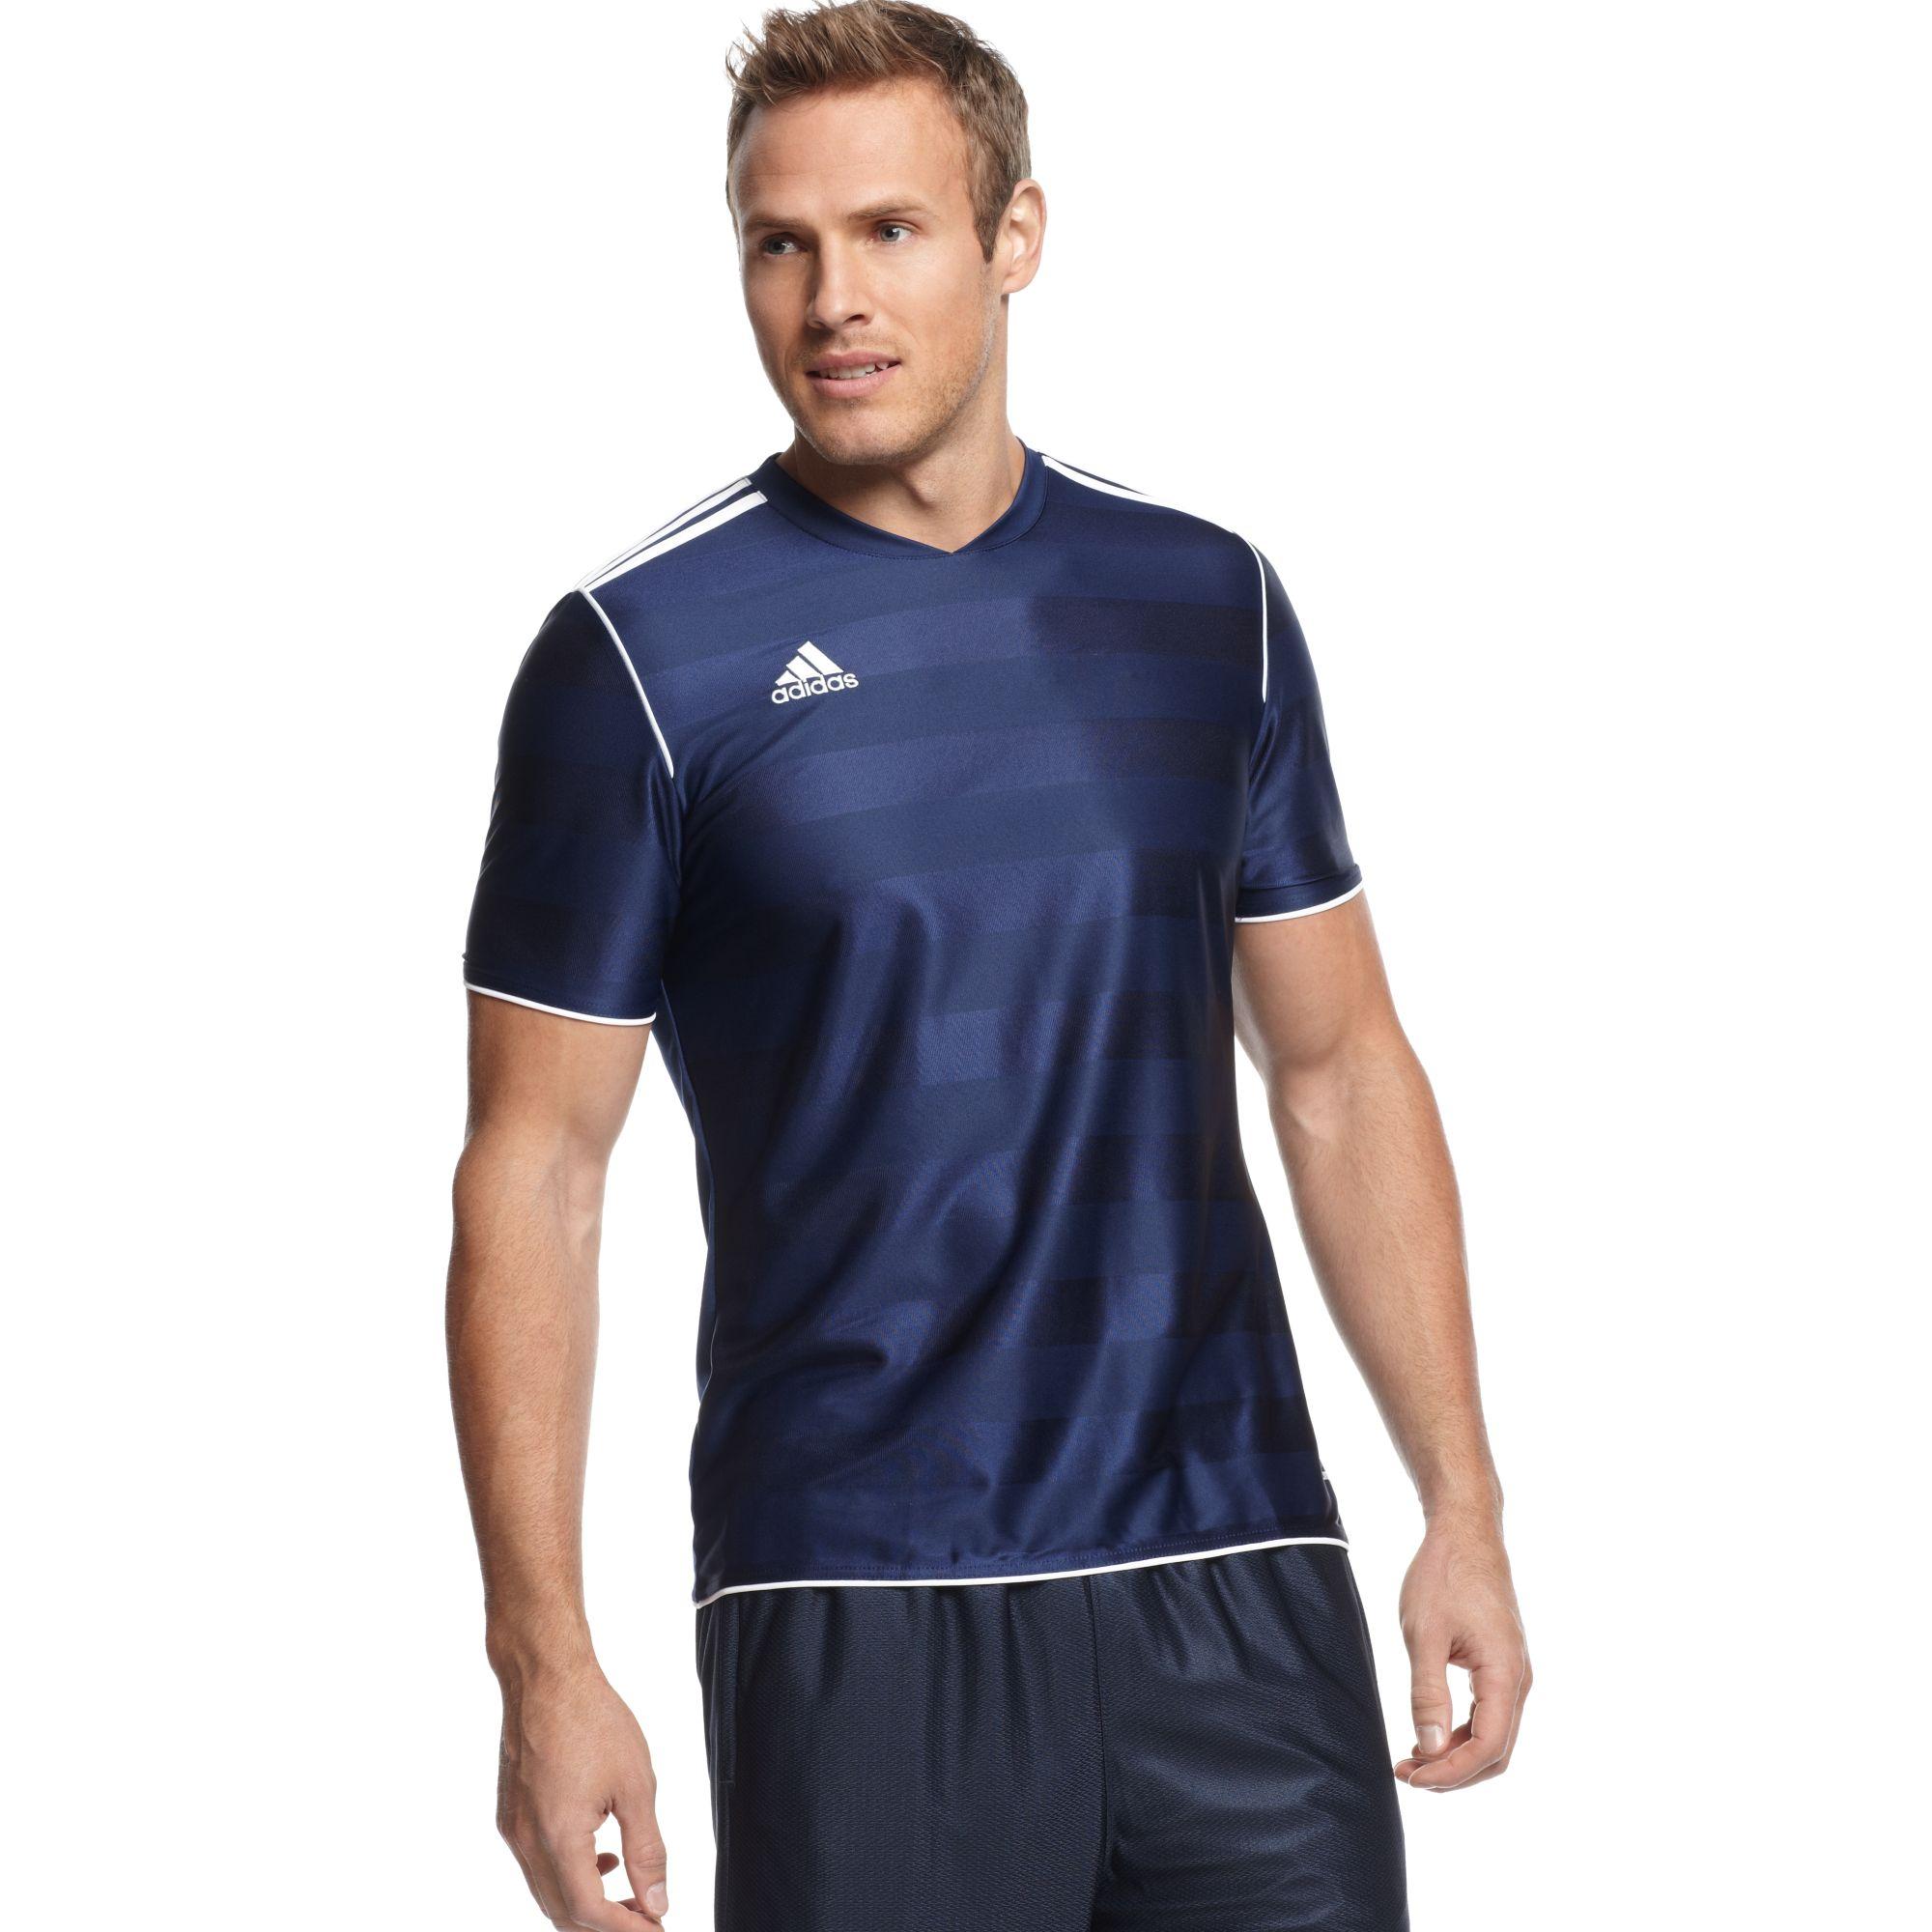 ADIDAS TABELA SHIRT Jersey Climalite Men's Sport Blue White